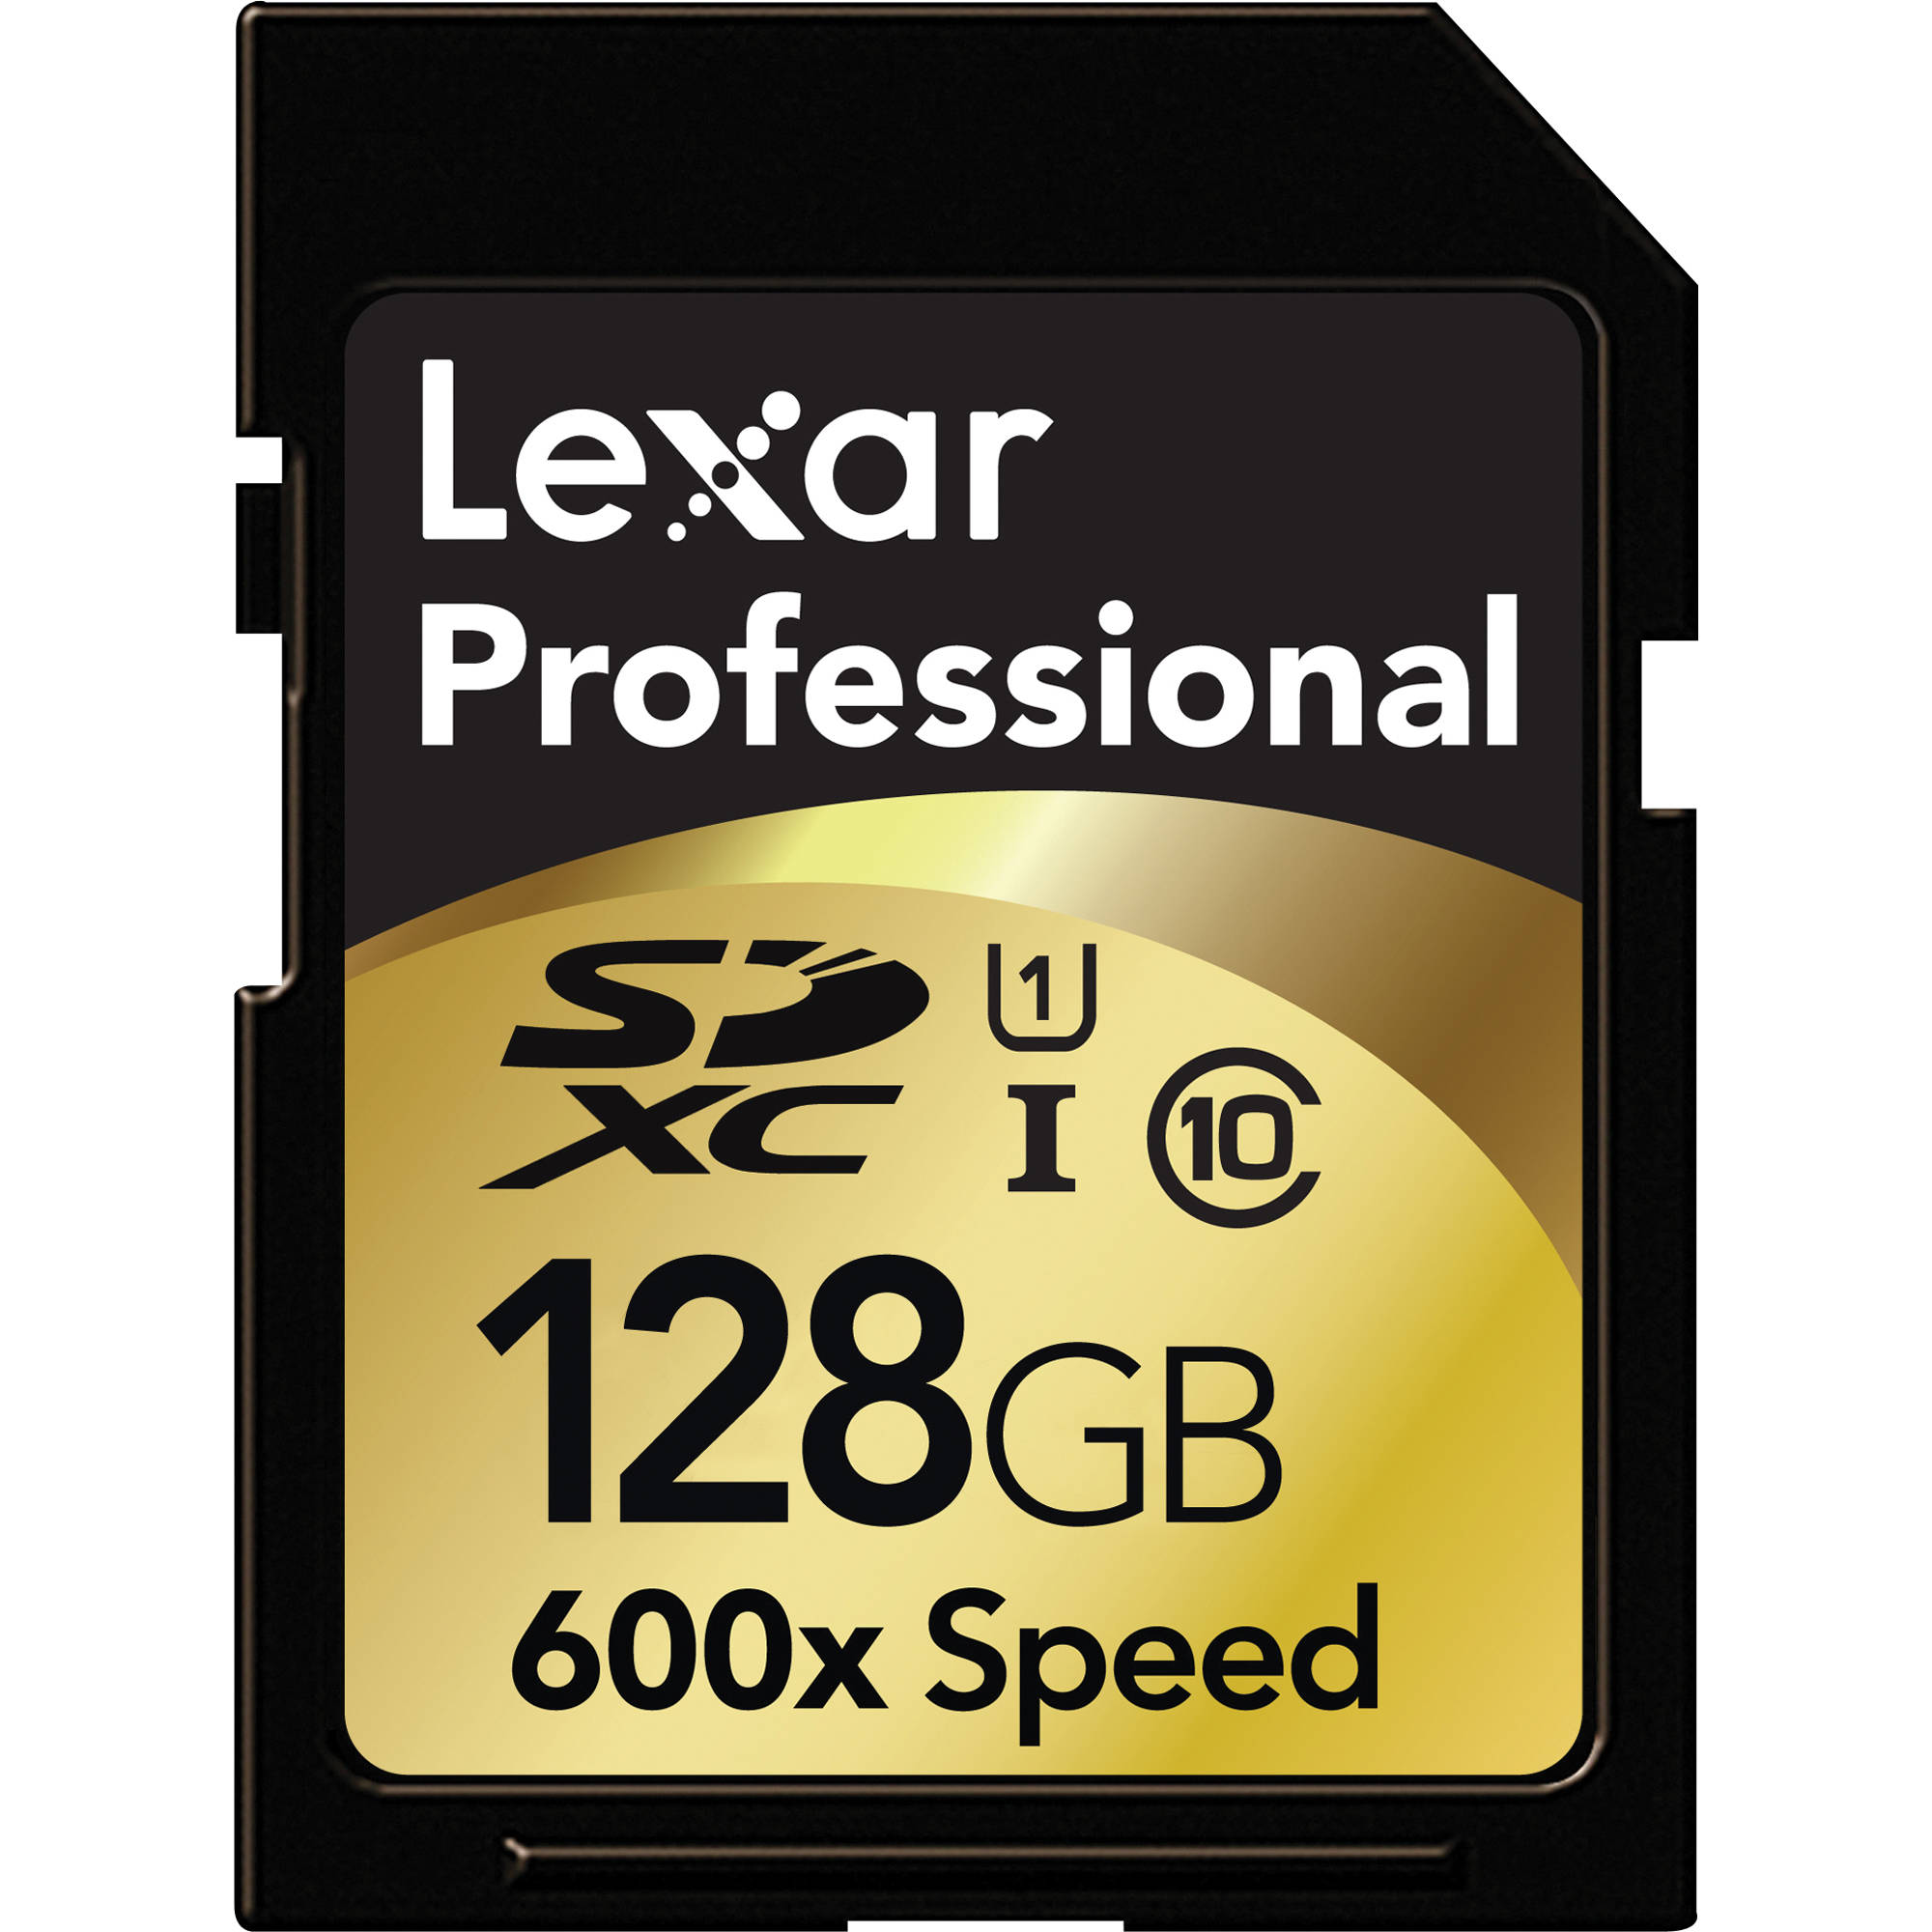 Lexar 128GB SDXC Memory Card Professional Class 10